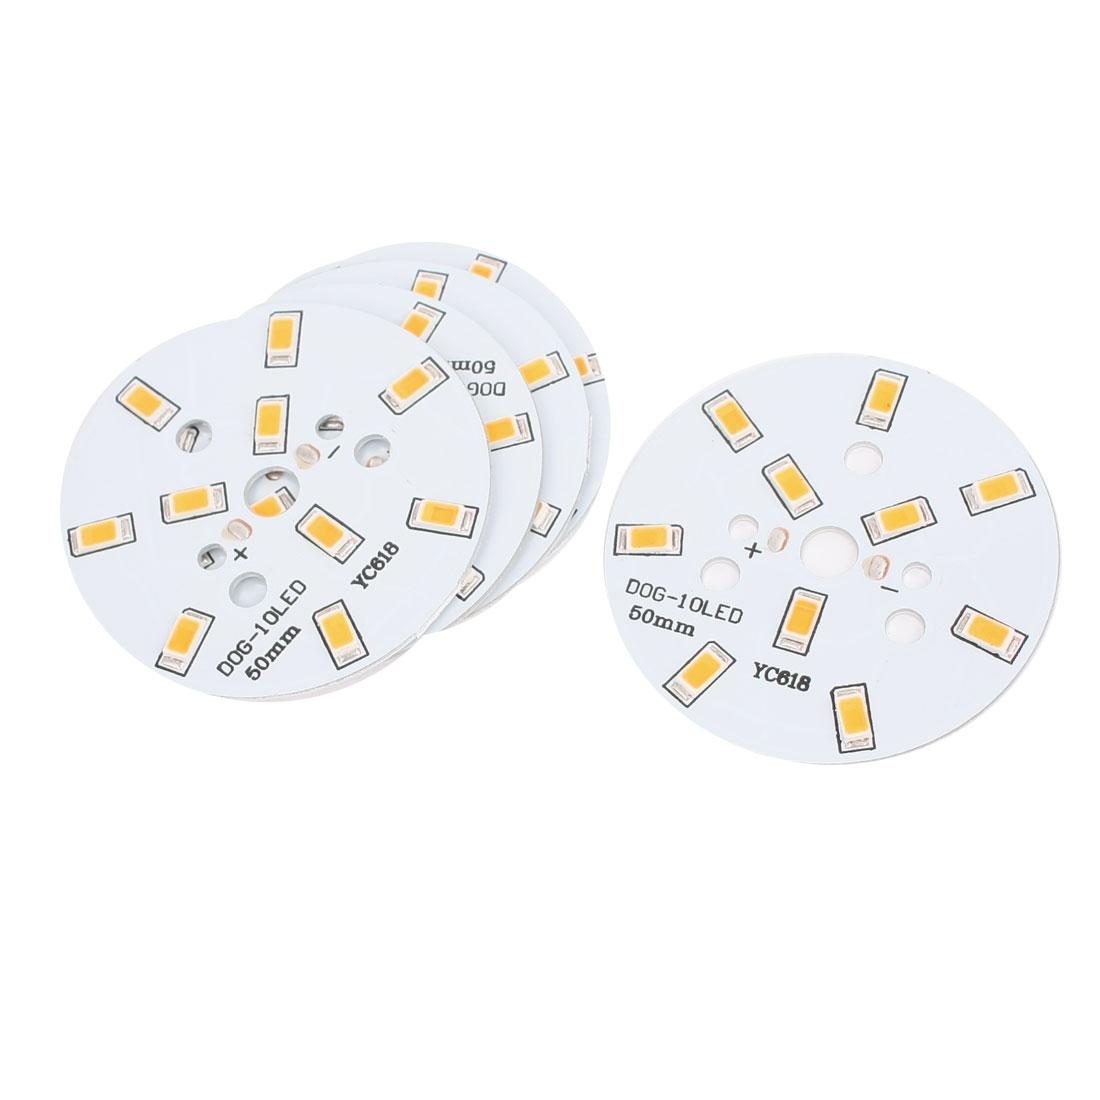 5 Pcs 5W Warm White SMD 5630 10 LED Spot Light Aluminum Base Board Heat Sink